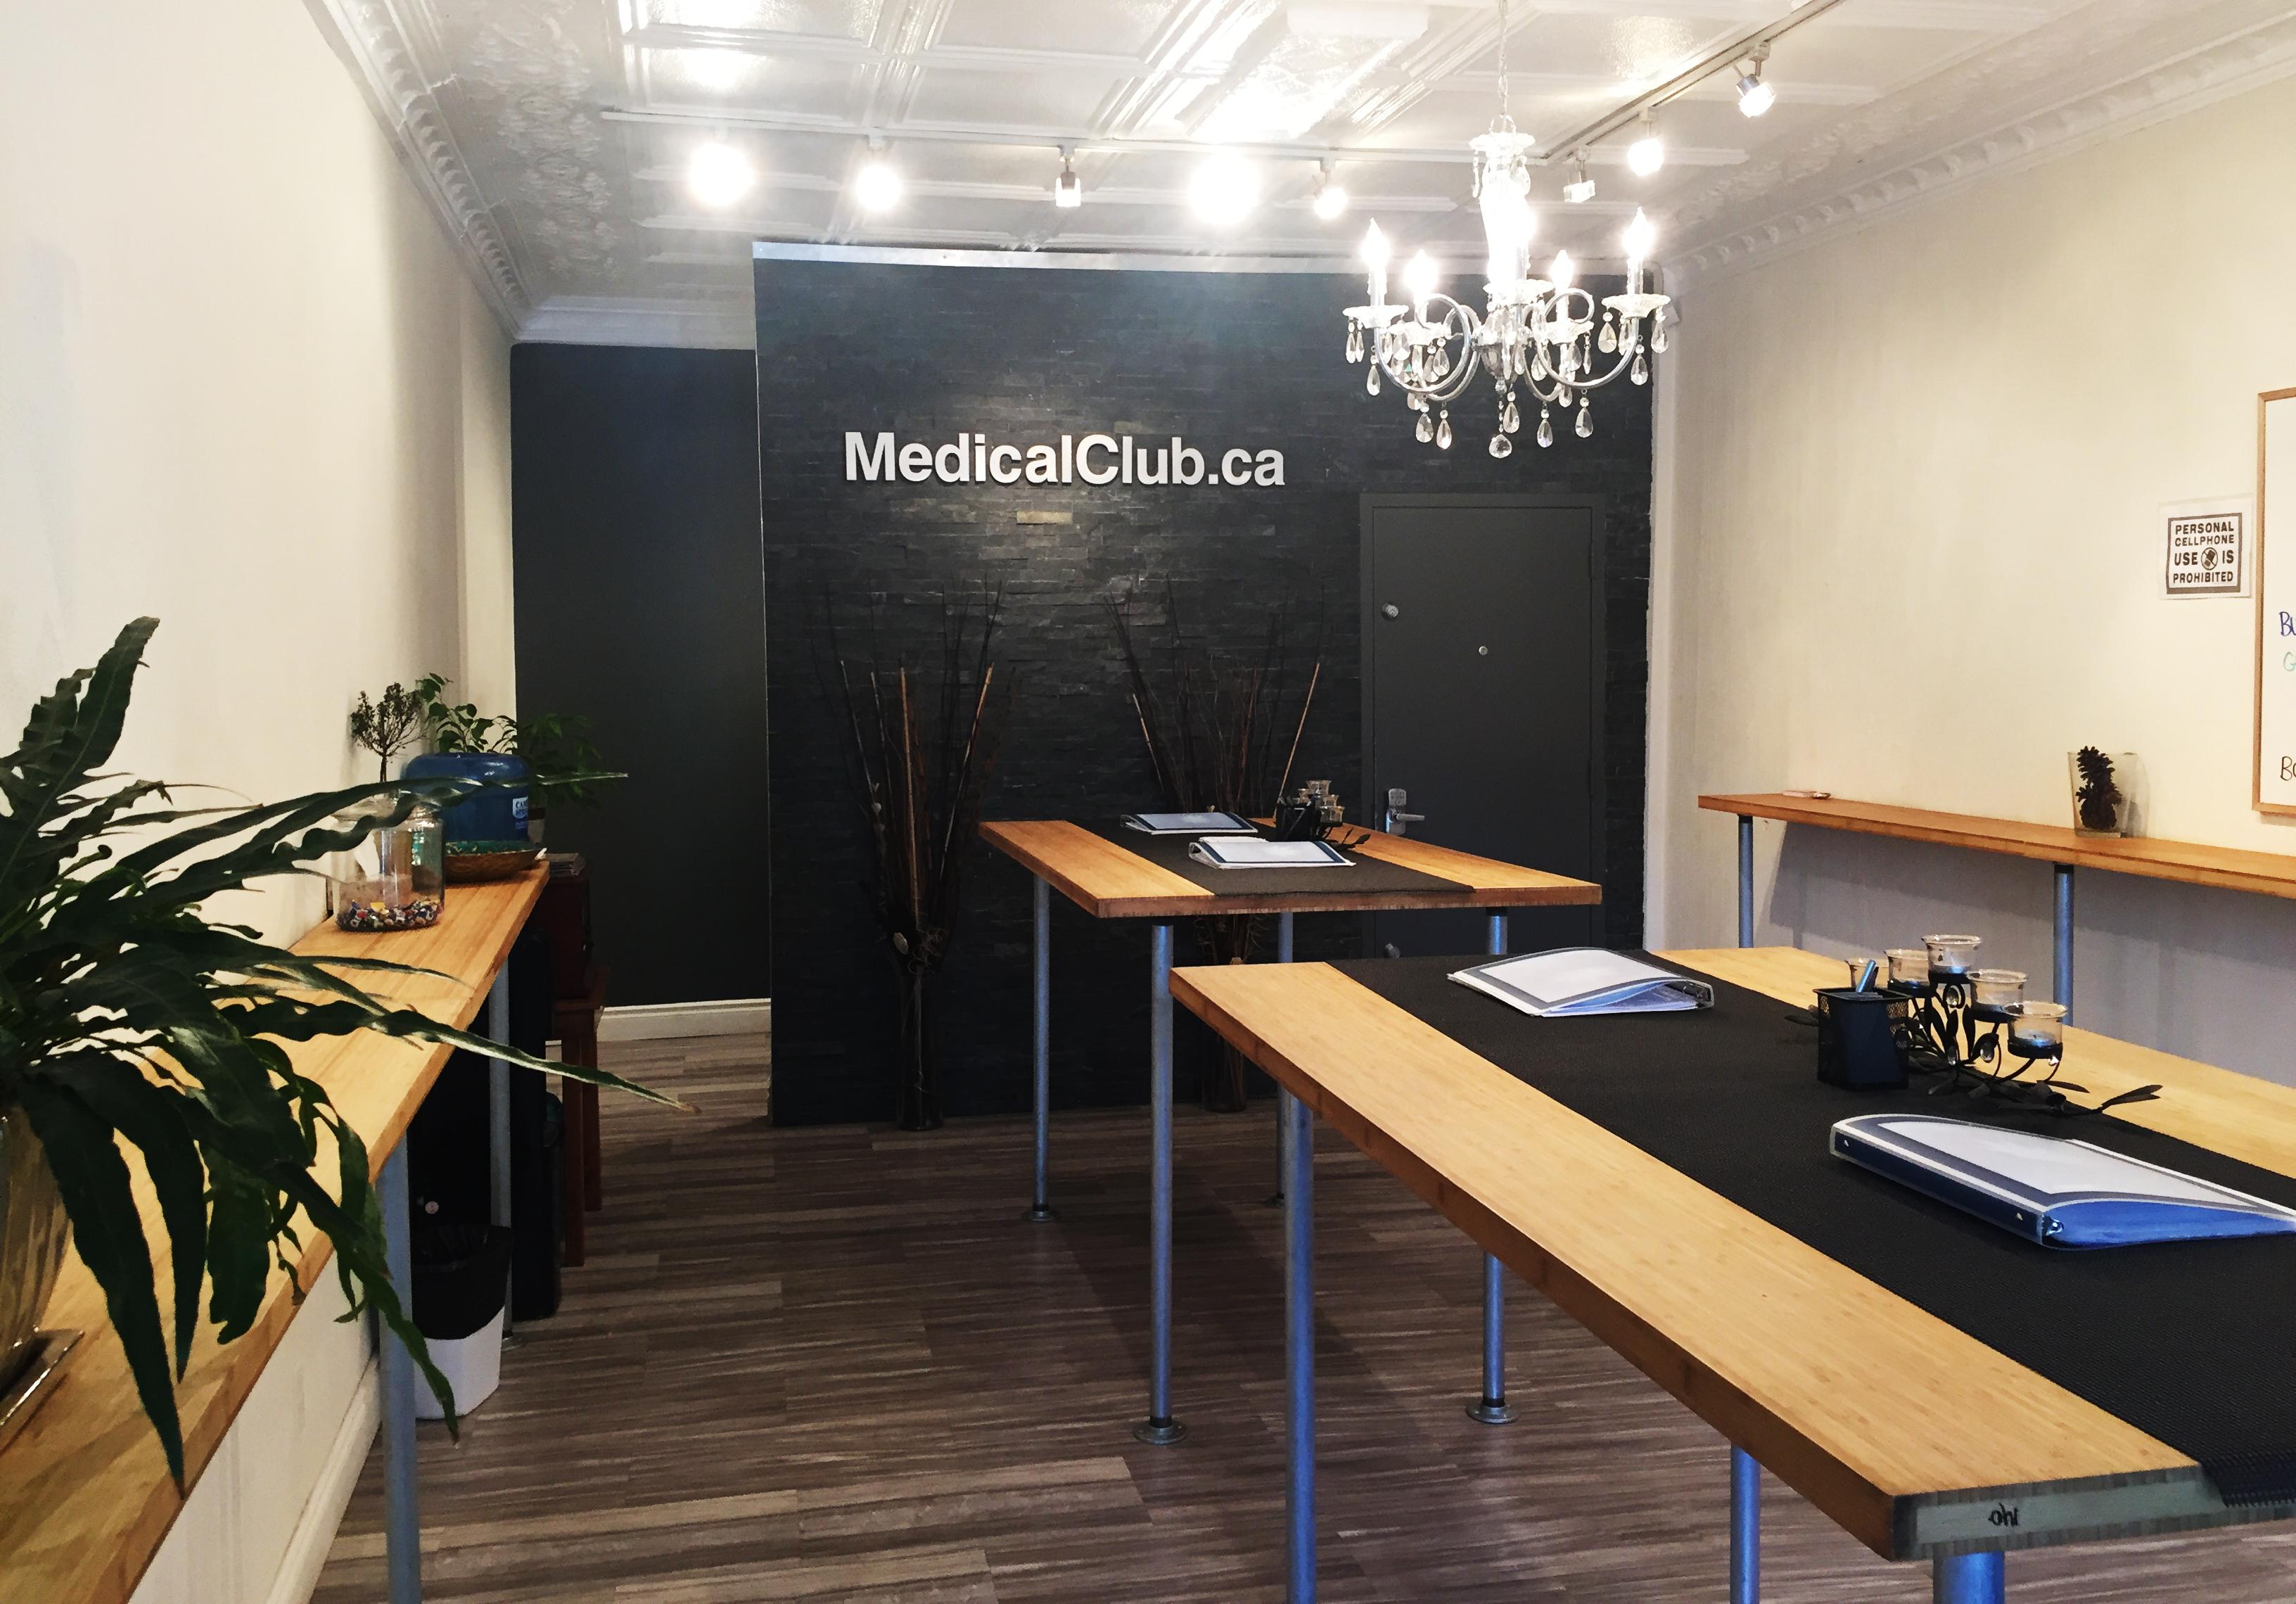 MedicalClub.ca medical marijuana dispensary in Toronto, Ontario, Canada